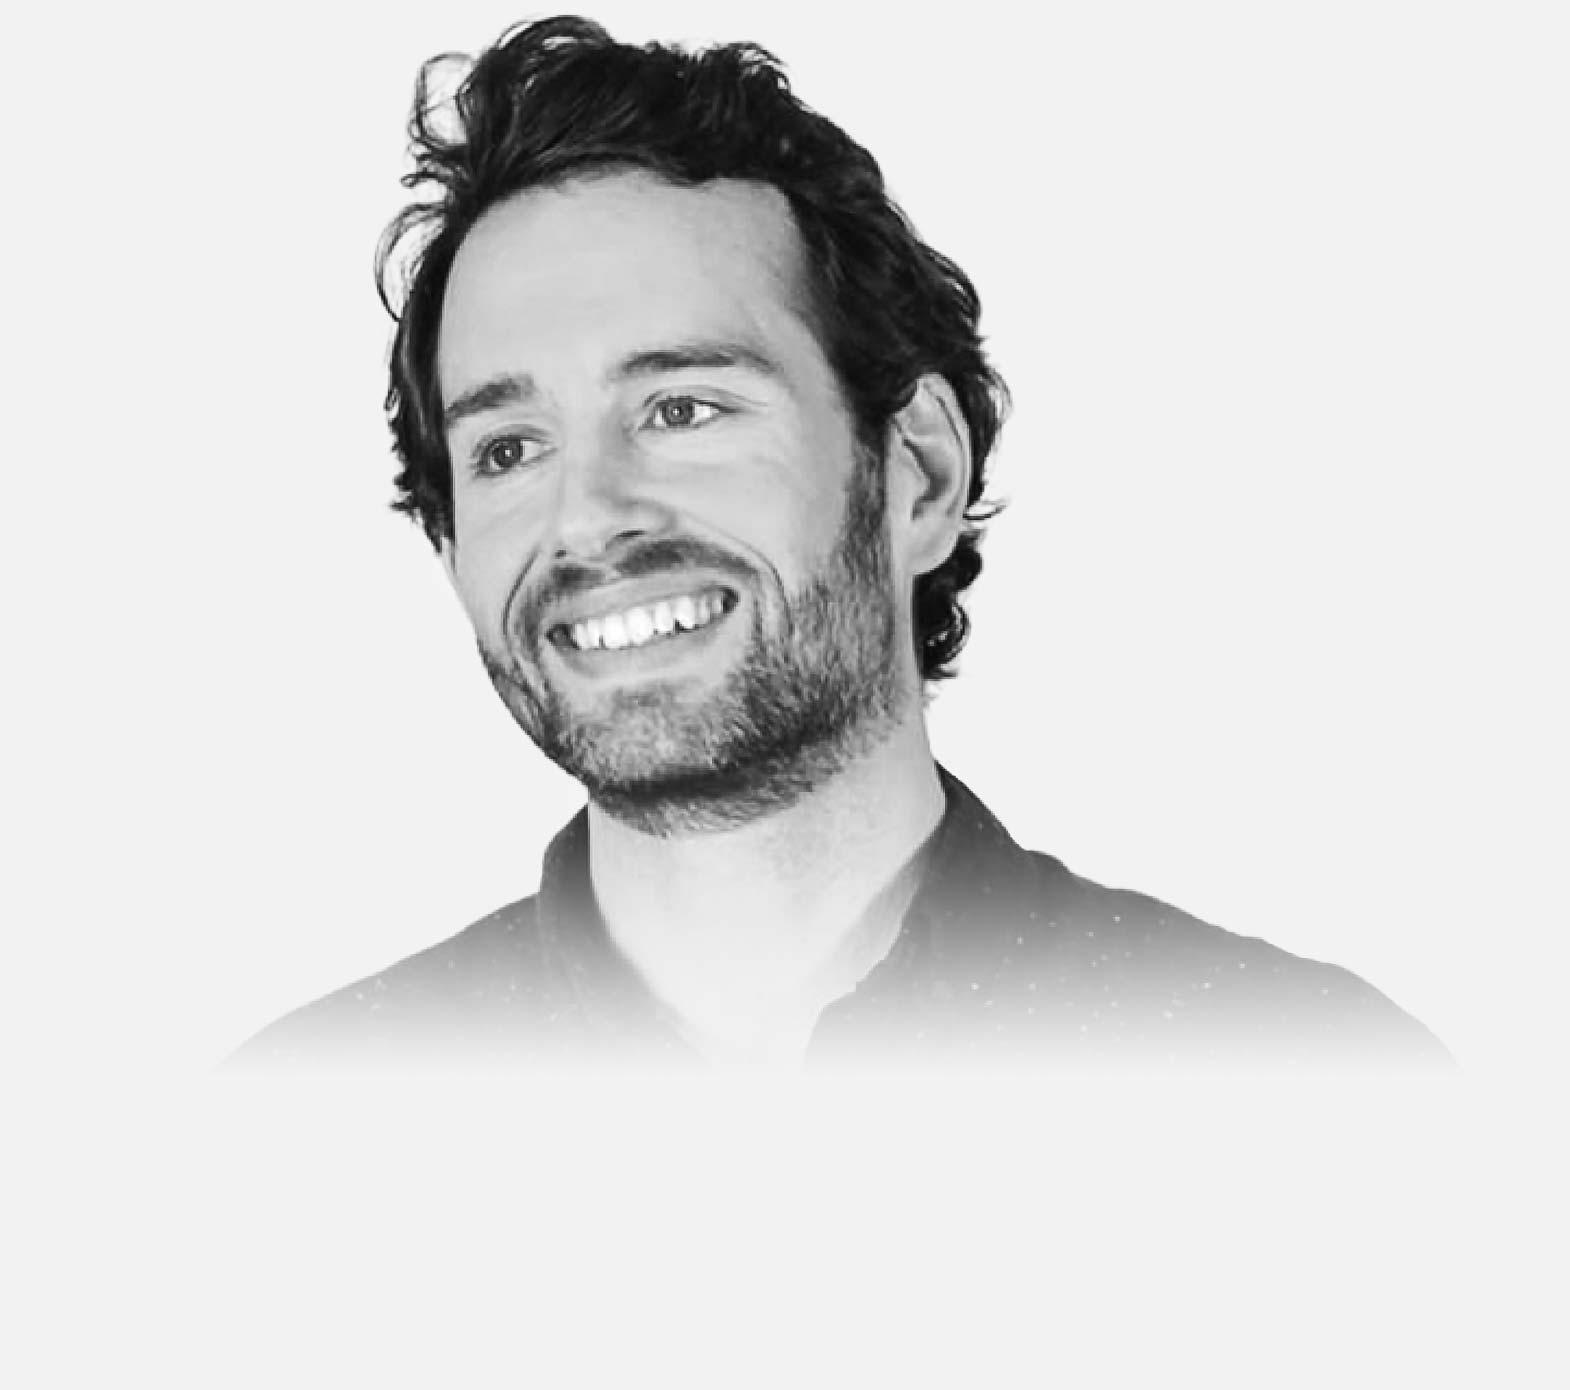 Portrait of Jon Aizlewood